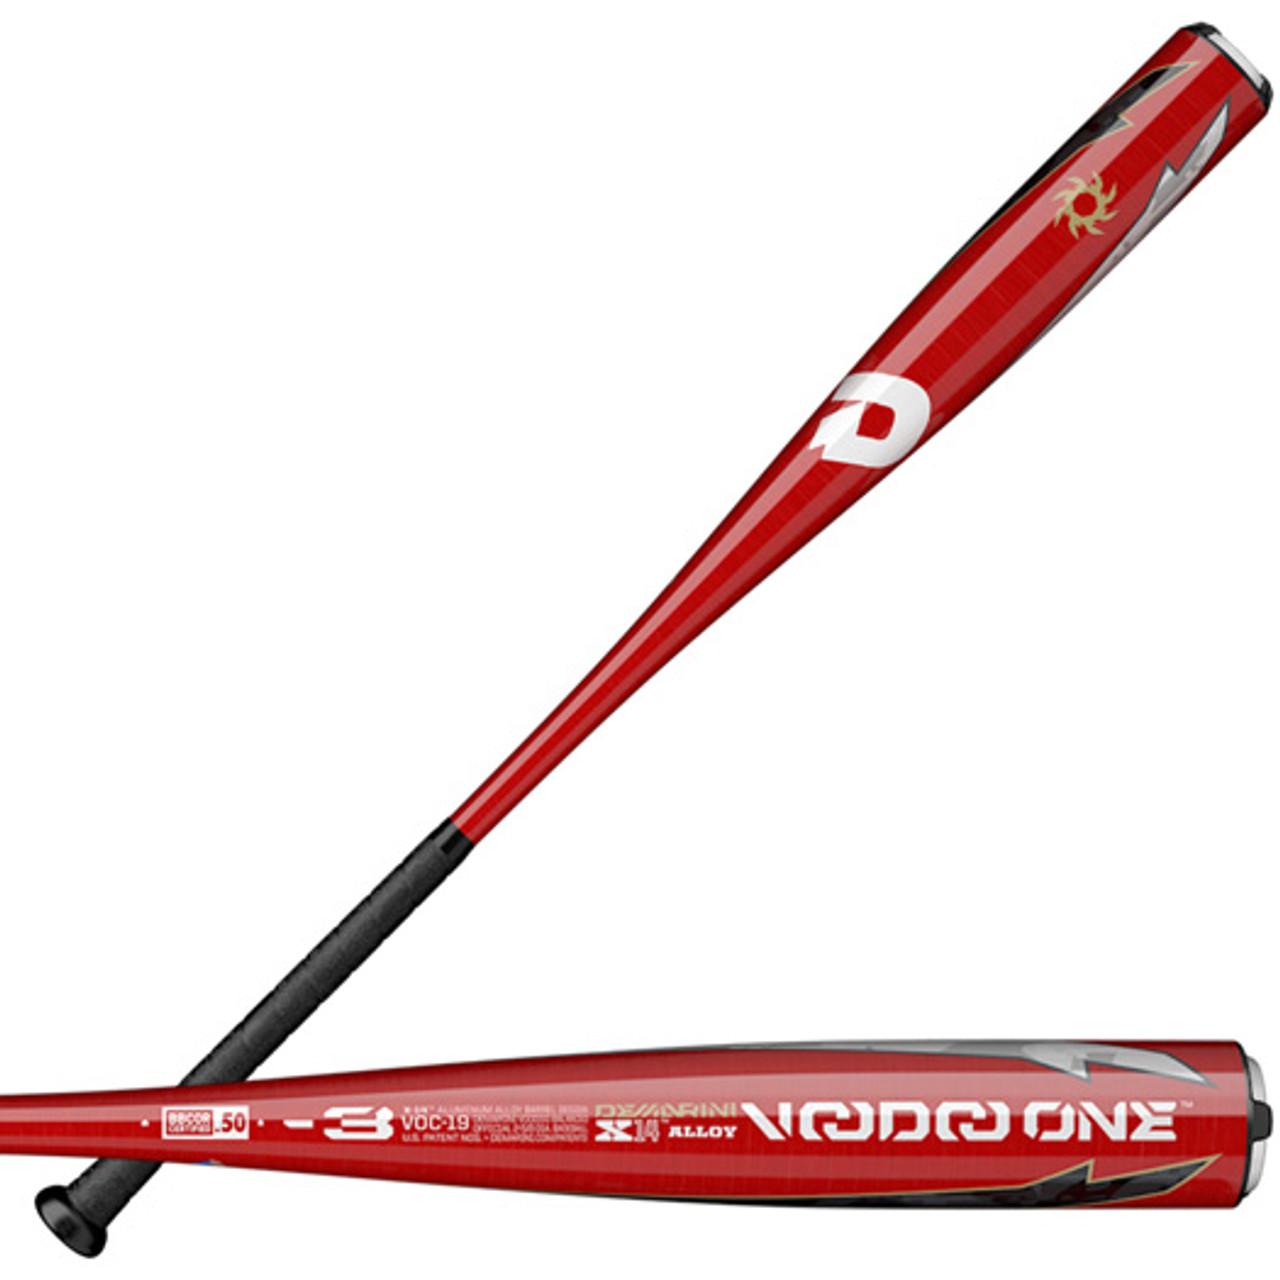 WTDXVOC 2019 DeMarini Voodoo One BBCOR Baseball Bat